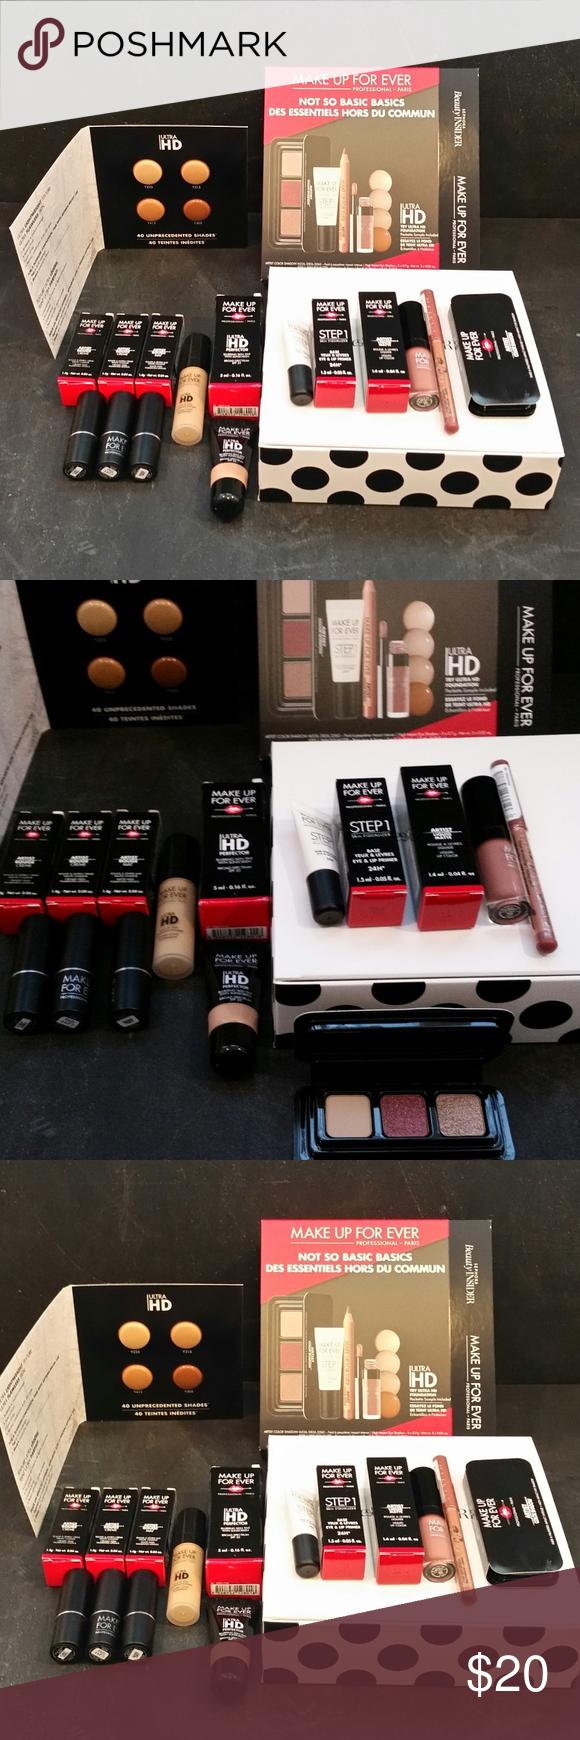 Sephora Beauty Insider Play Makeup For Ever NWT